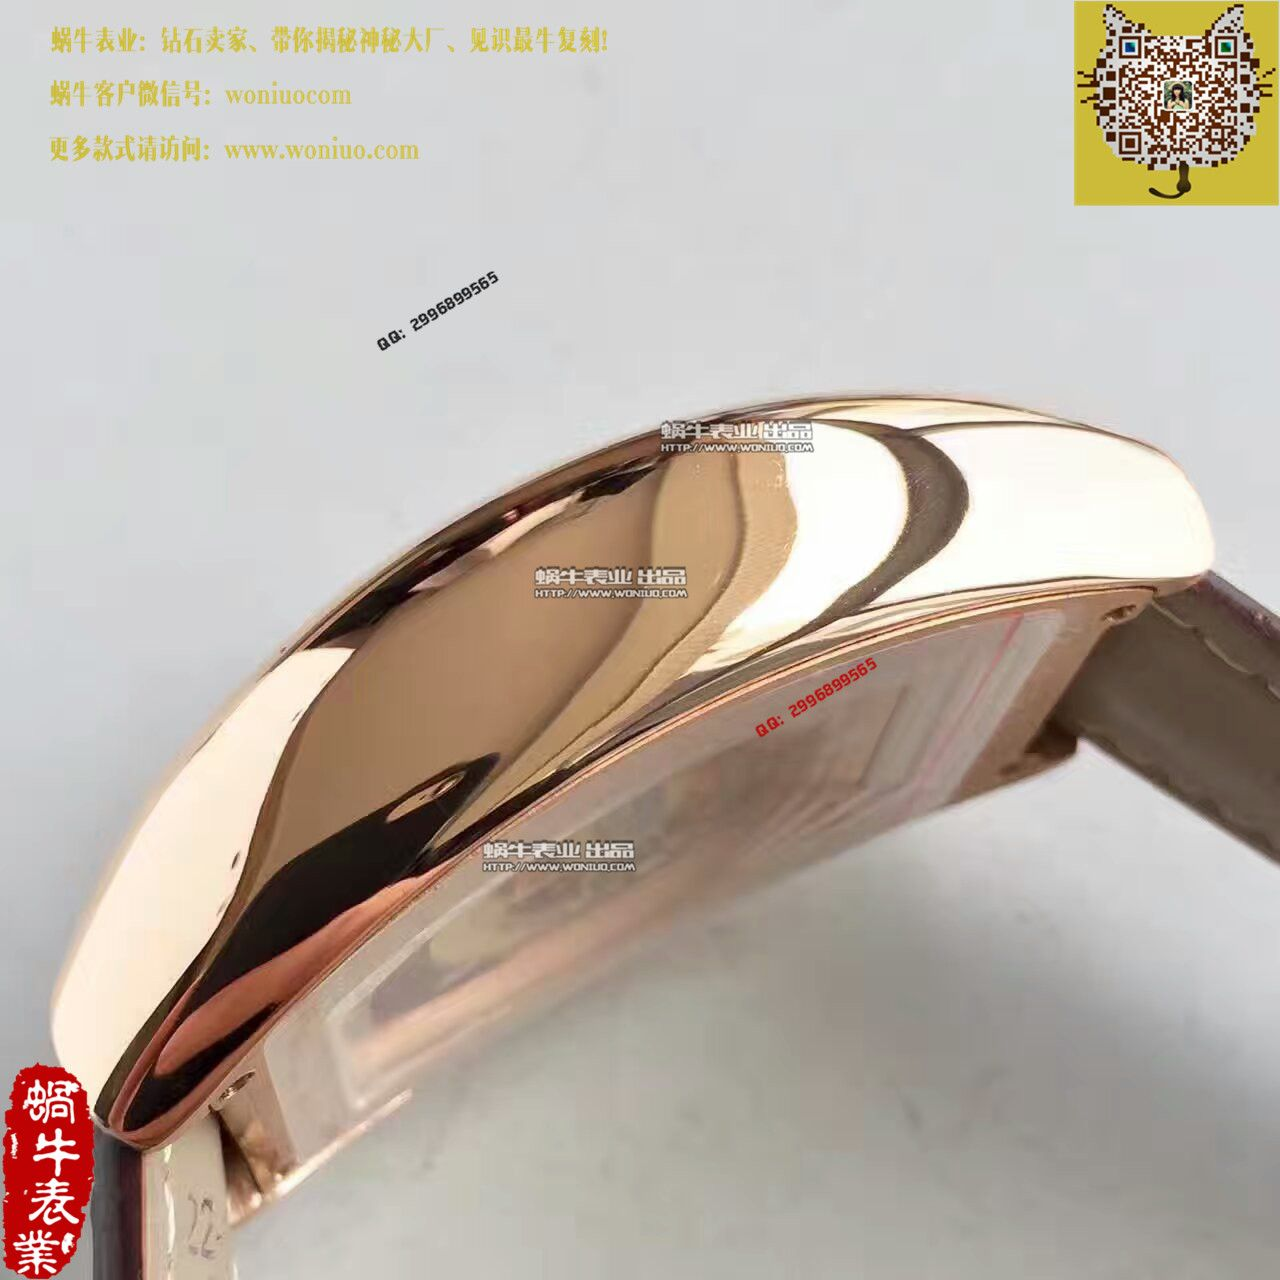 【FM厂一比一高仿手表】法穆兰MEN'S COLLECTION系列8880 B S6 SQT腕表 / FL010